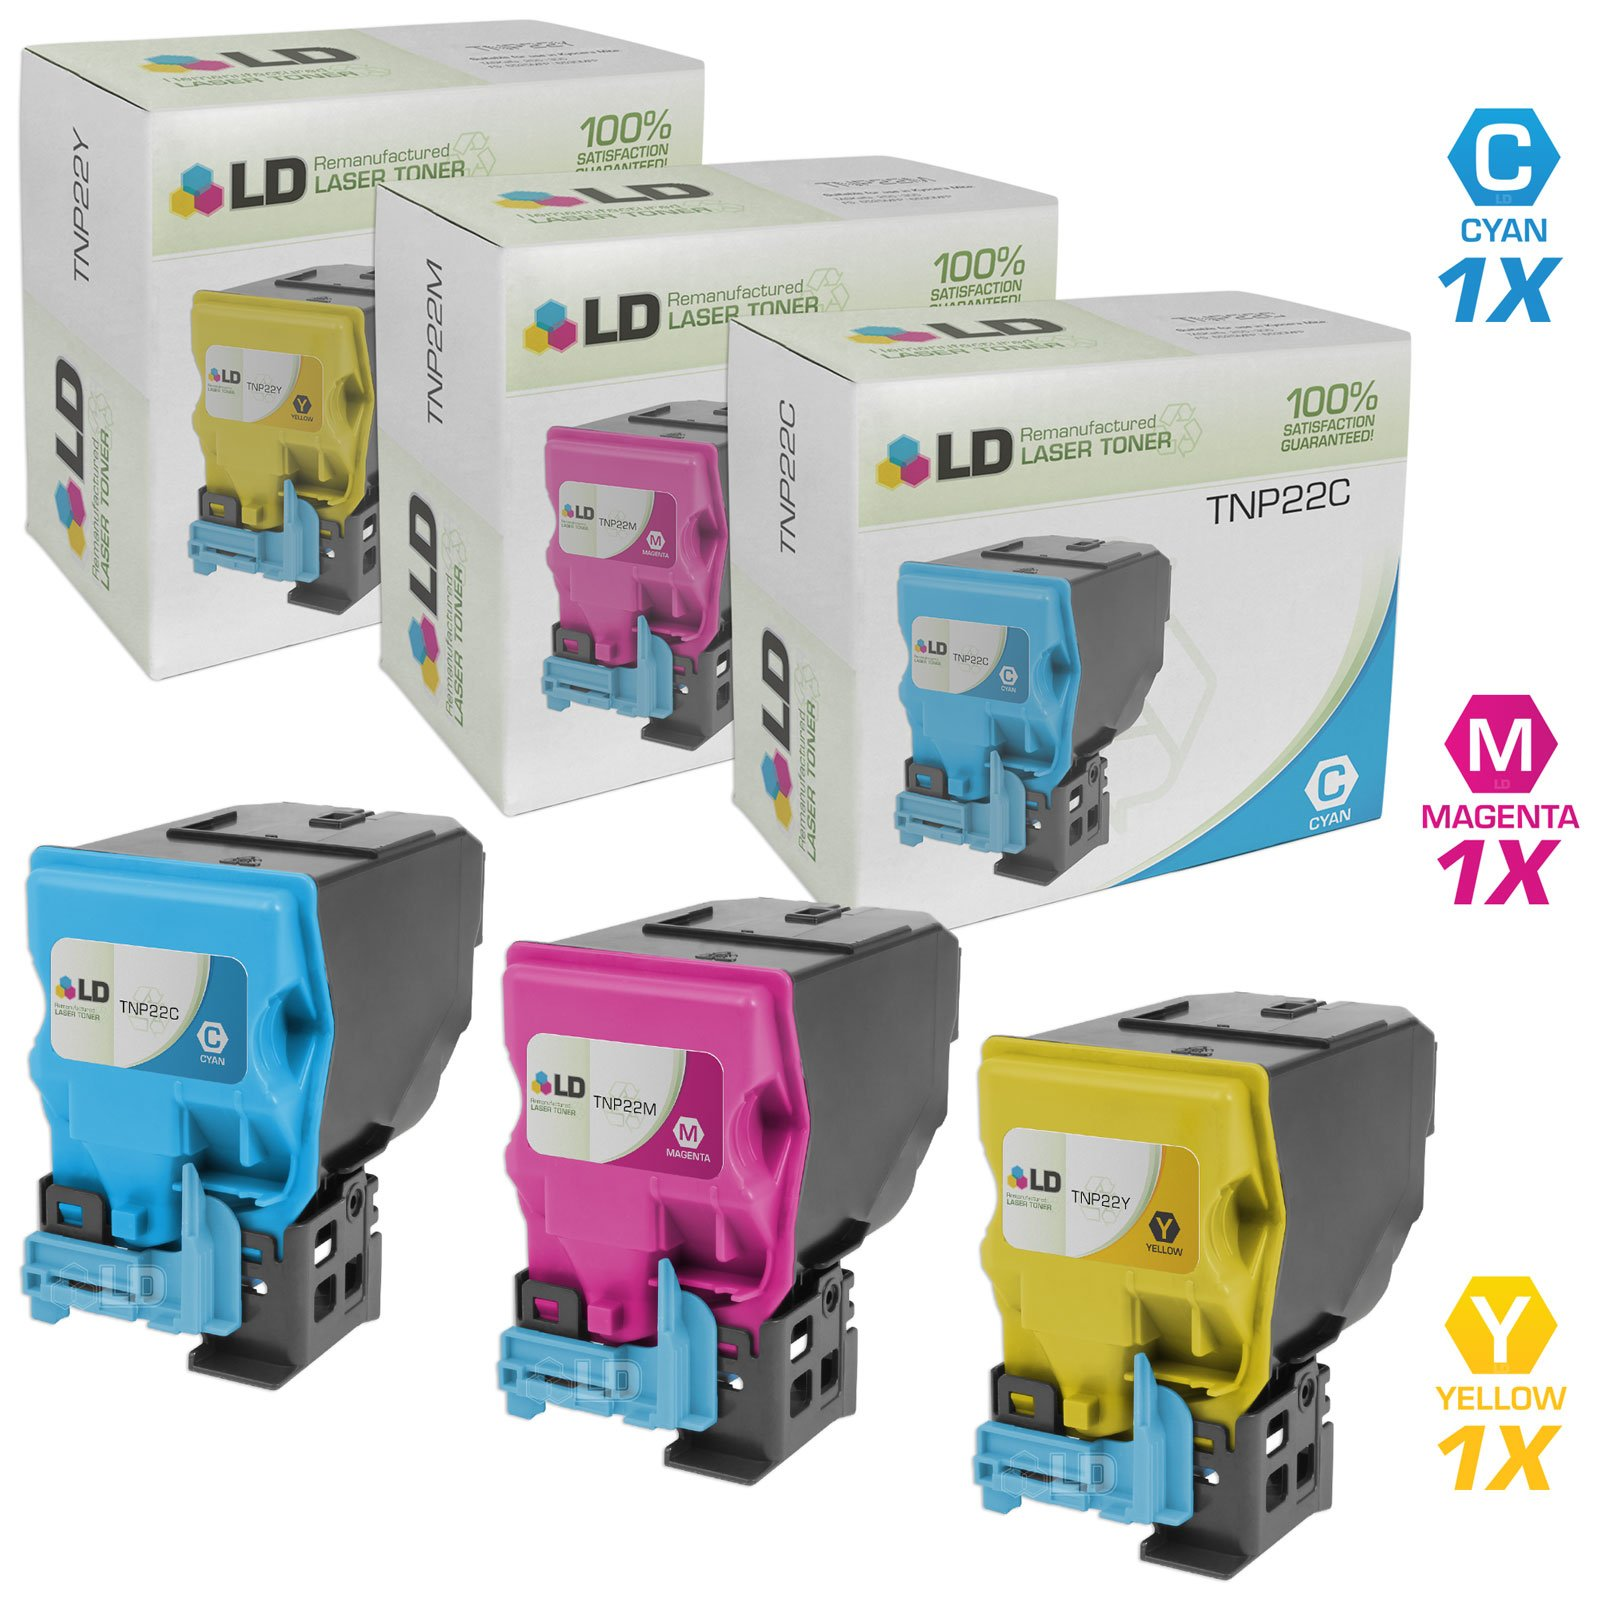 LD Remanufactured Toner Cartridge Replacement for Konica Minolta TNP22 C35 Series (Cyan, Magenta, Yellow, 3-Pack)